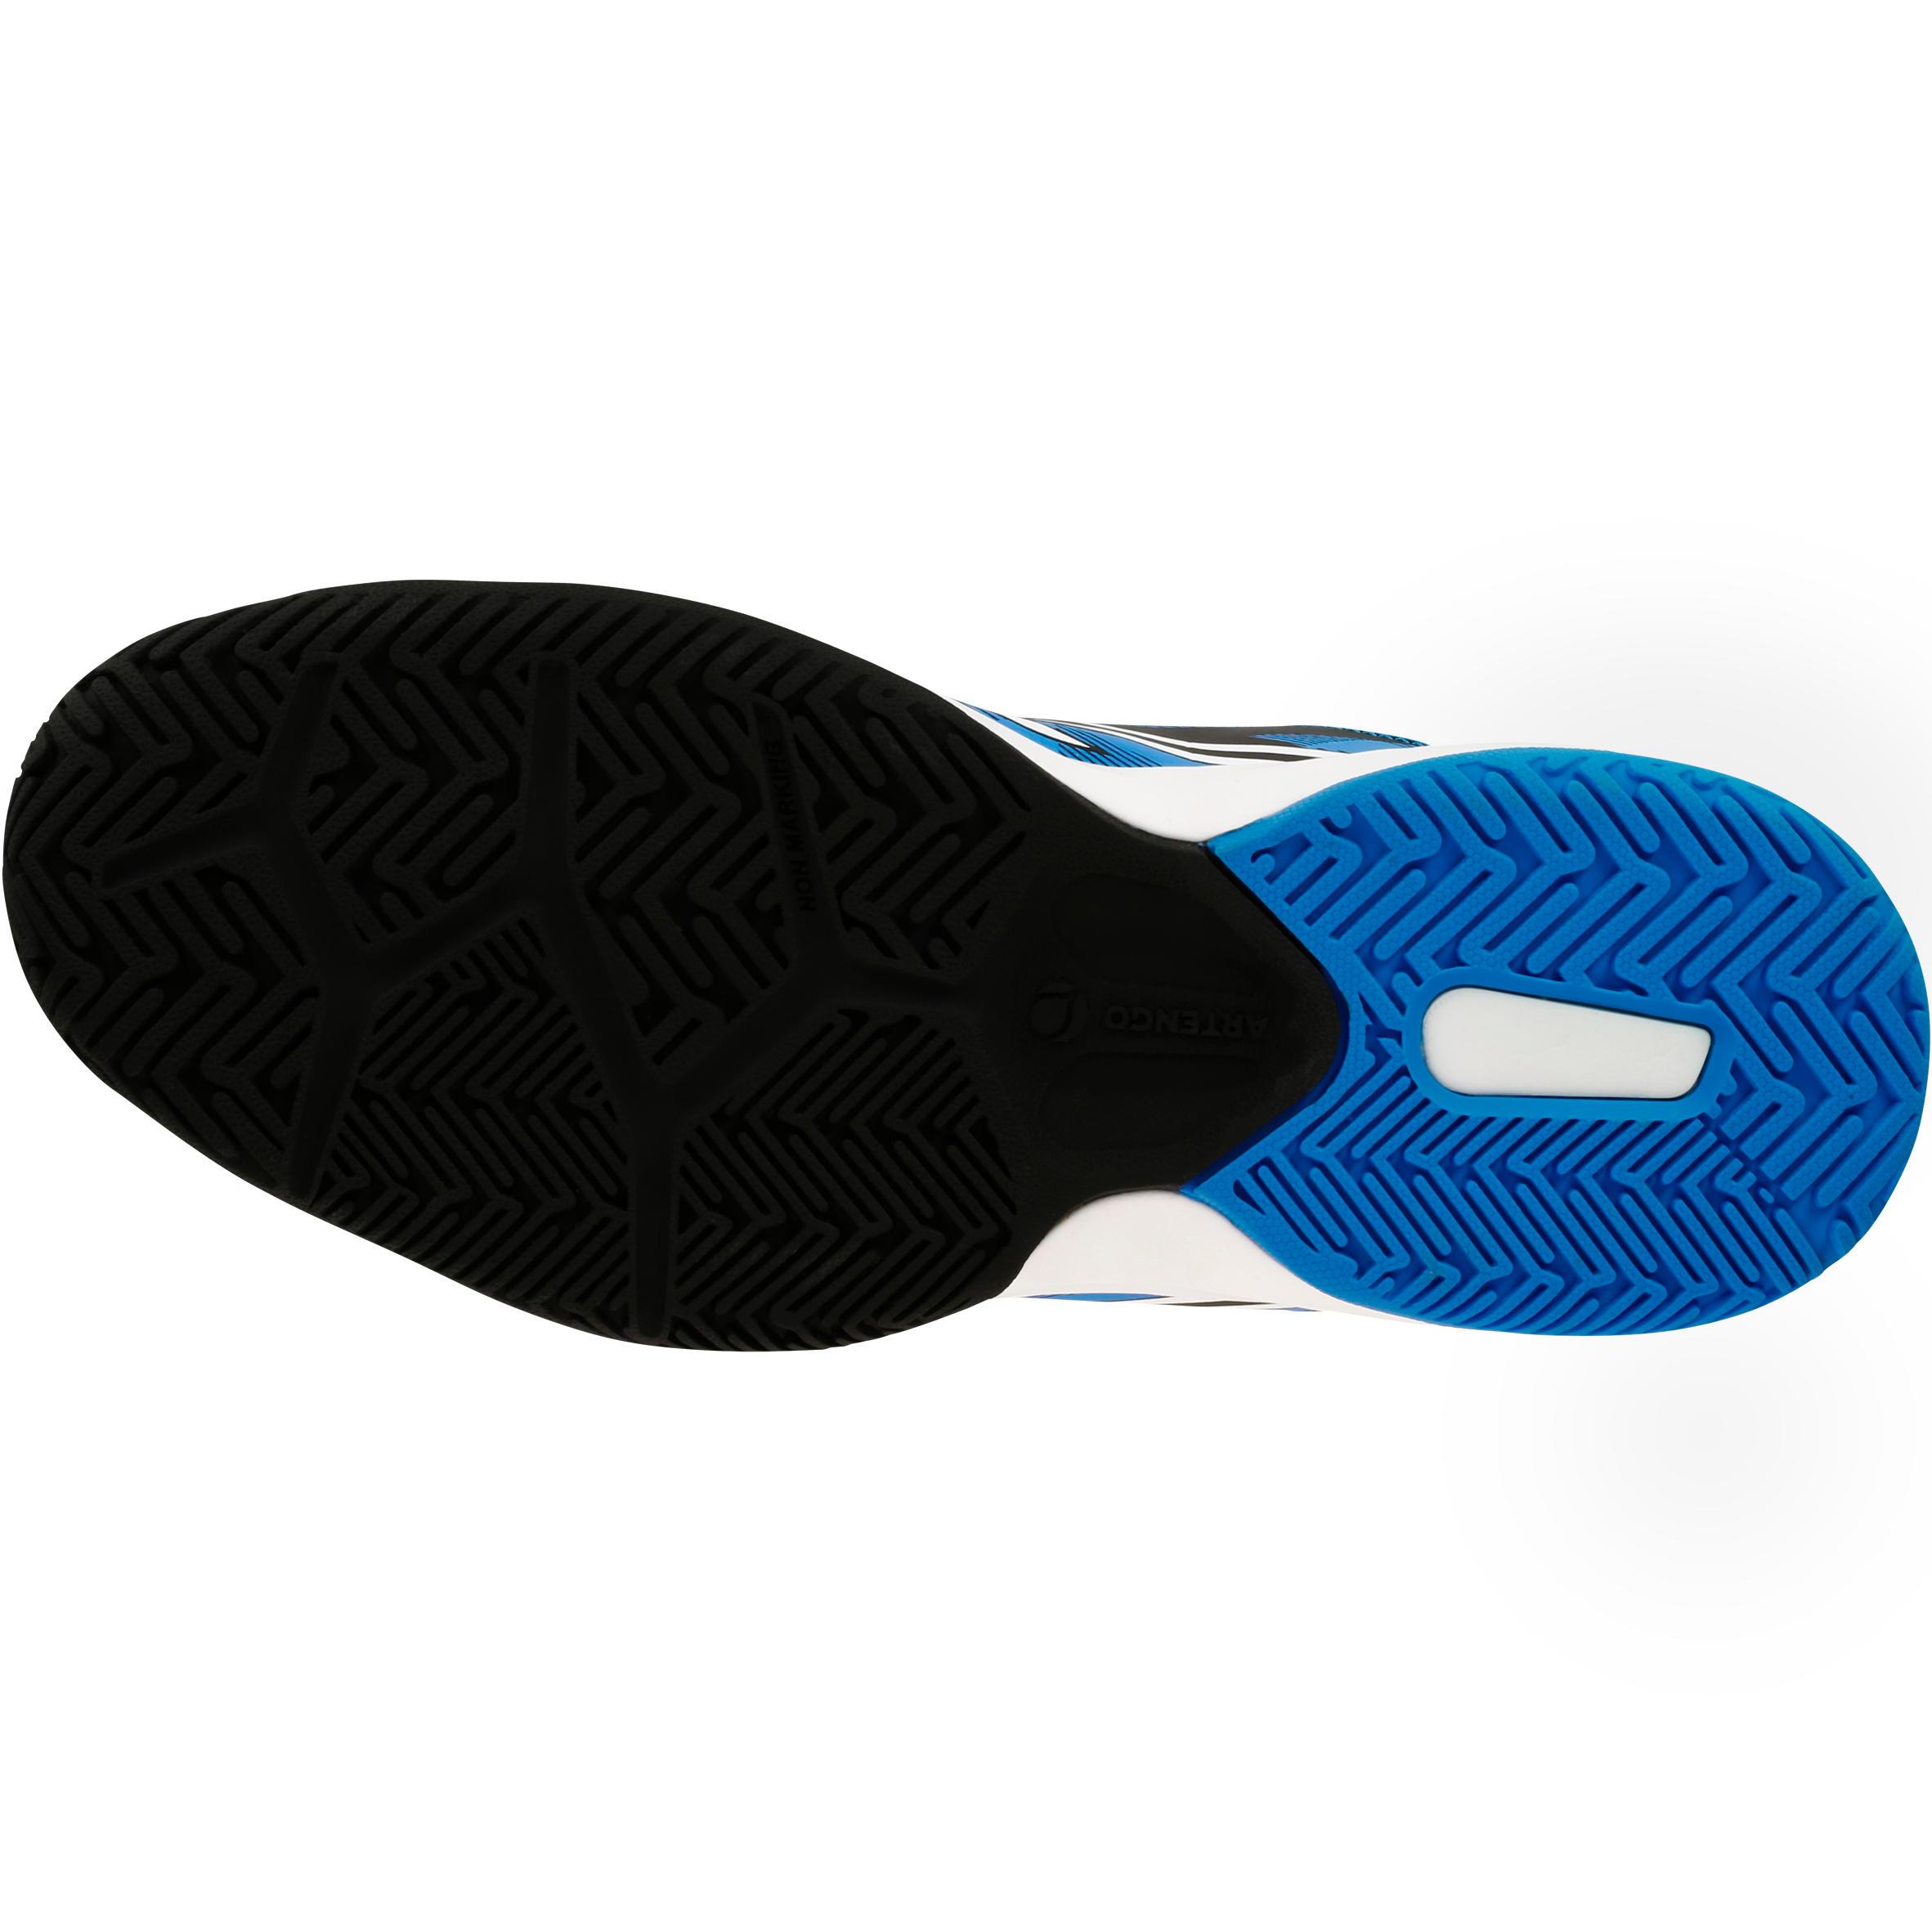 TS560 Kids' Tennis Shoes - Blue/Black